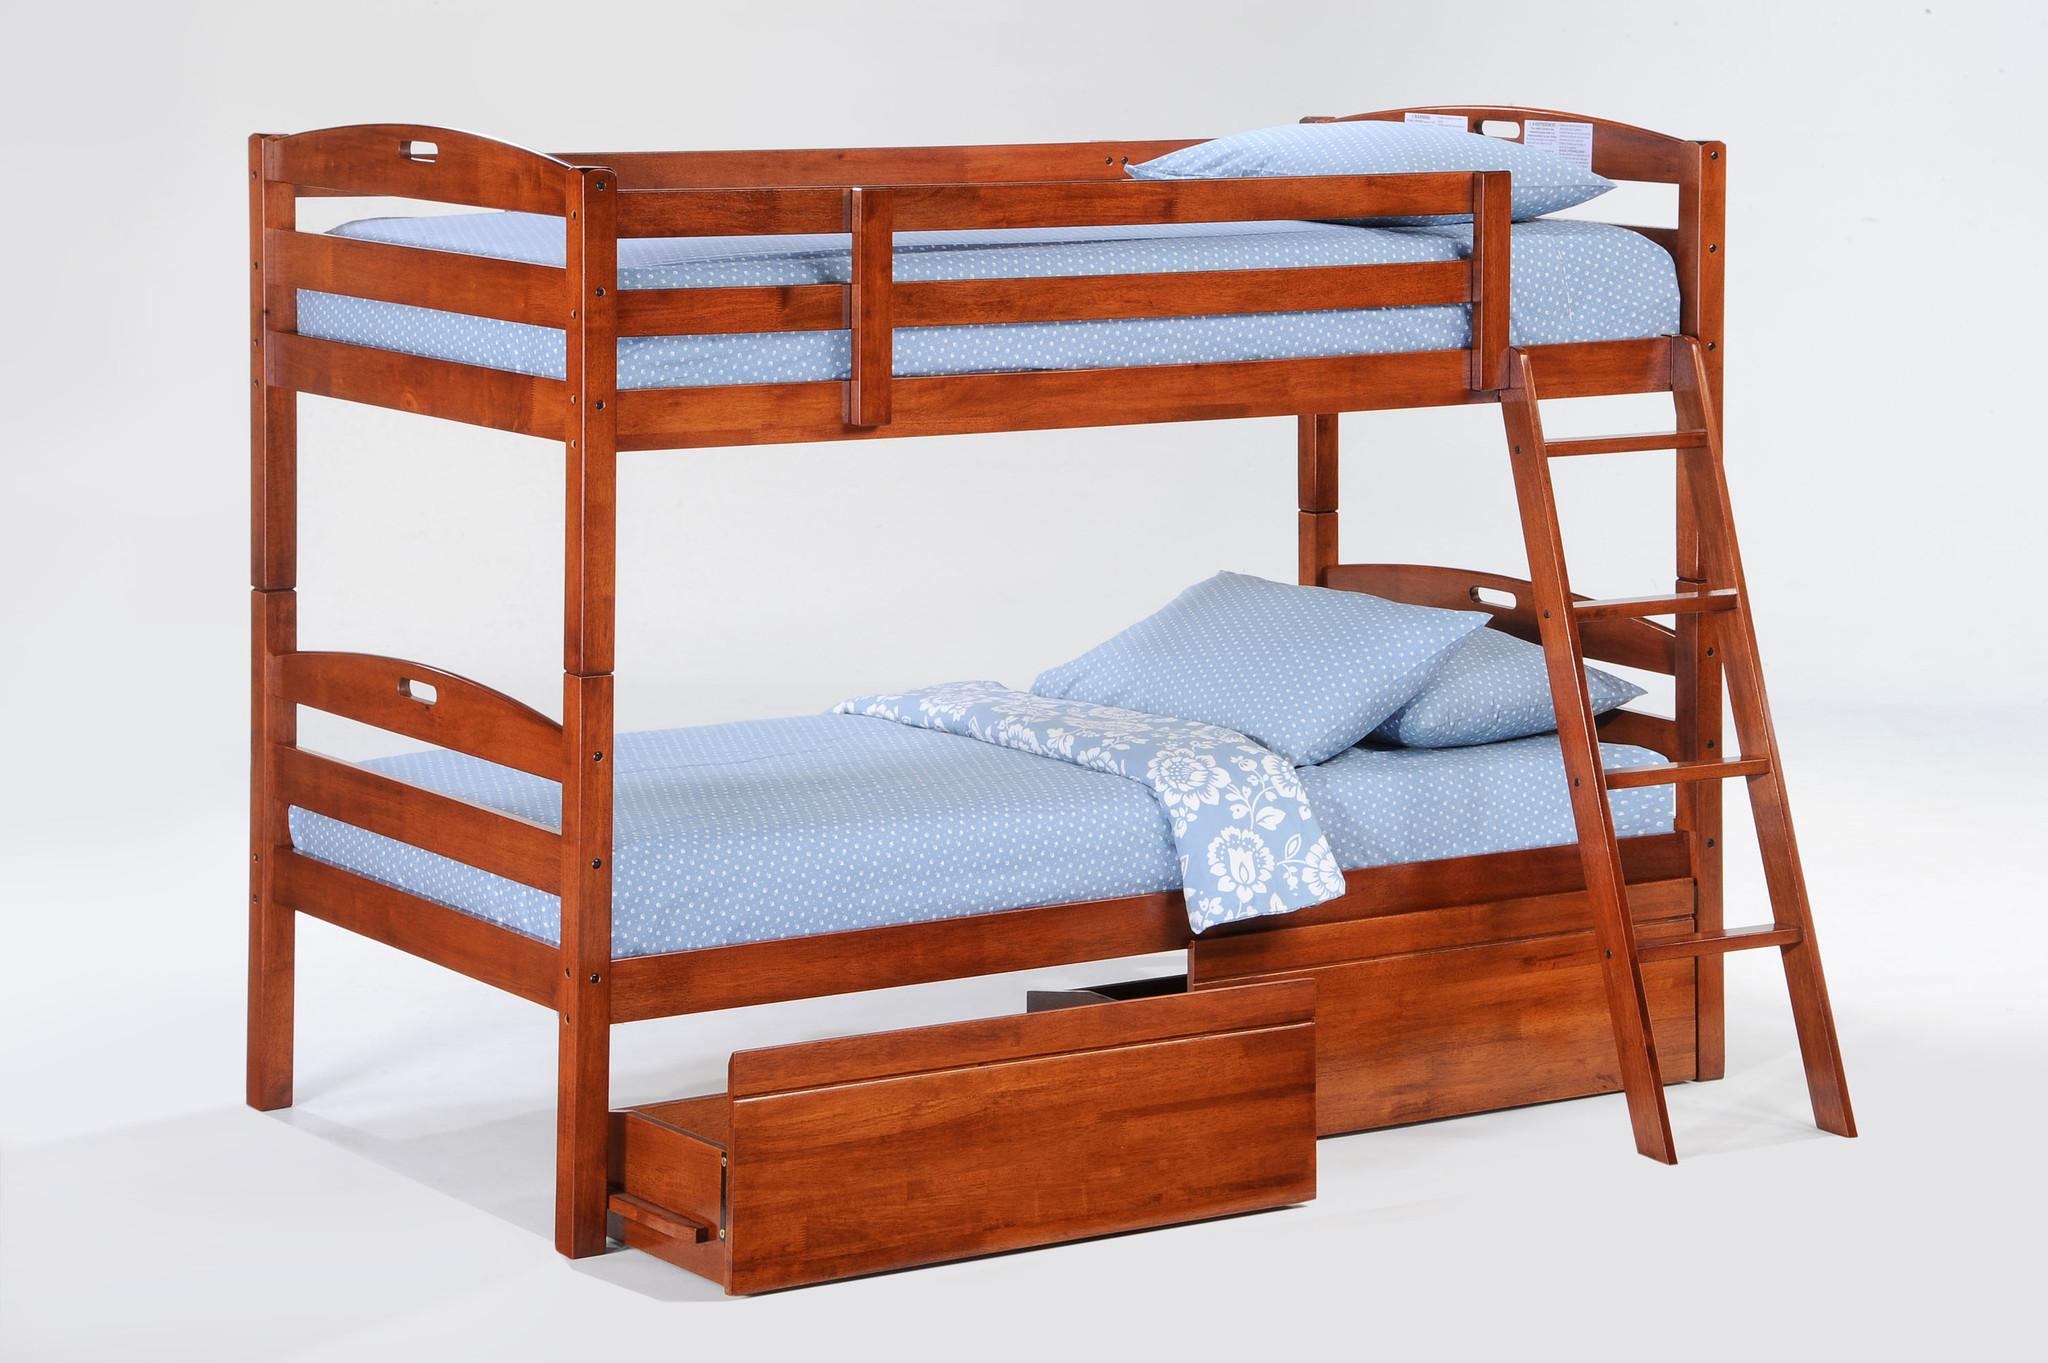 night day sesame twin bunk cherry w drawer opened.jpg